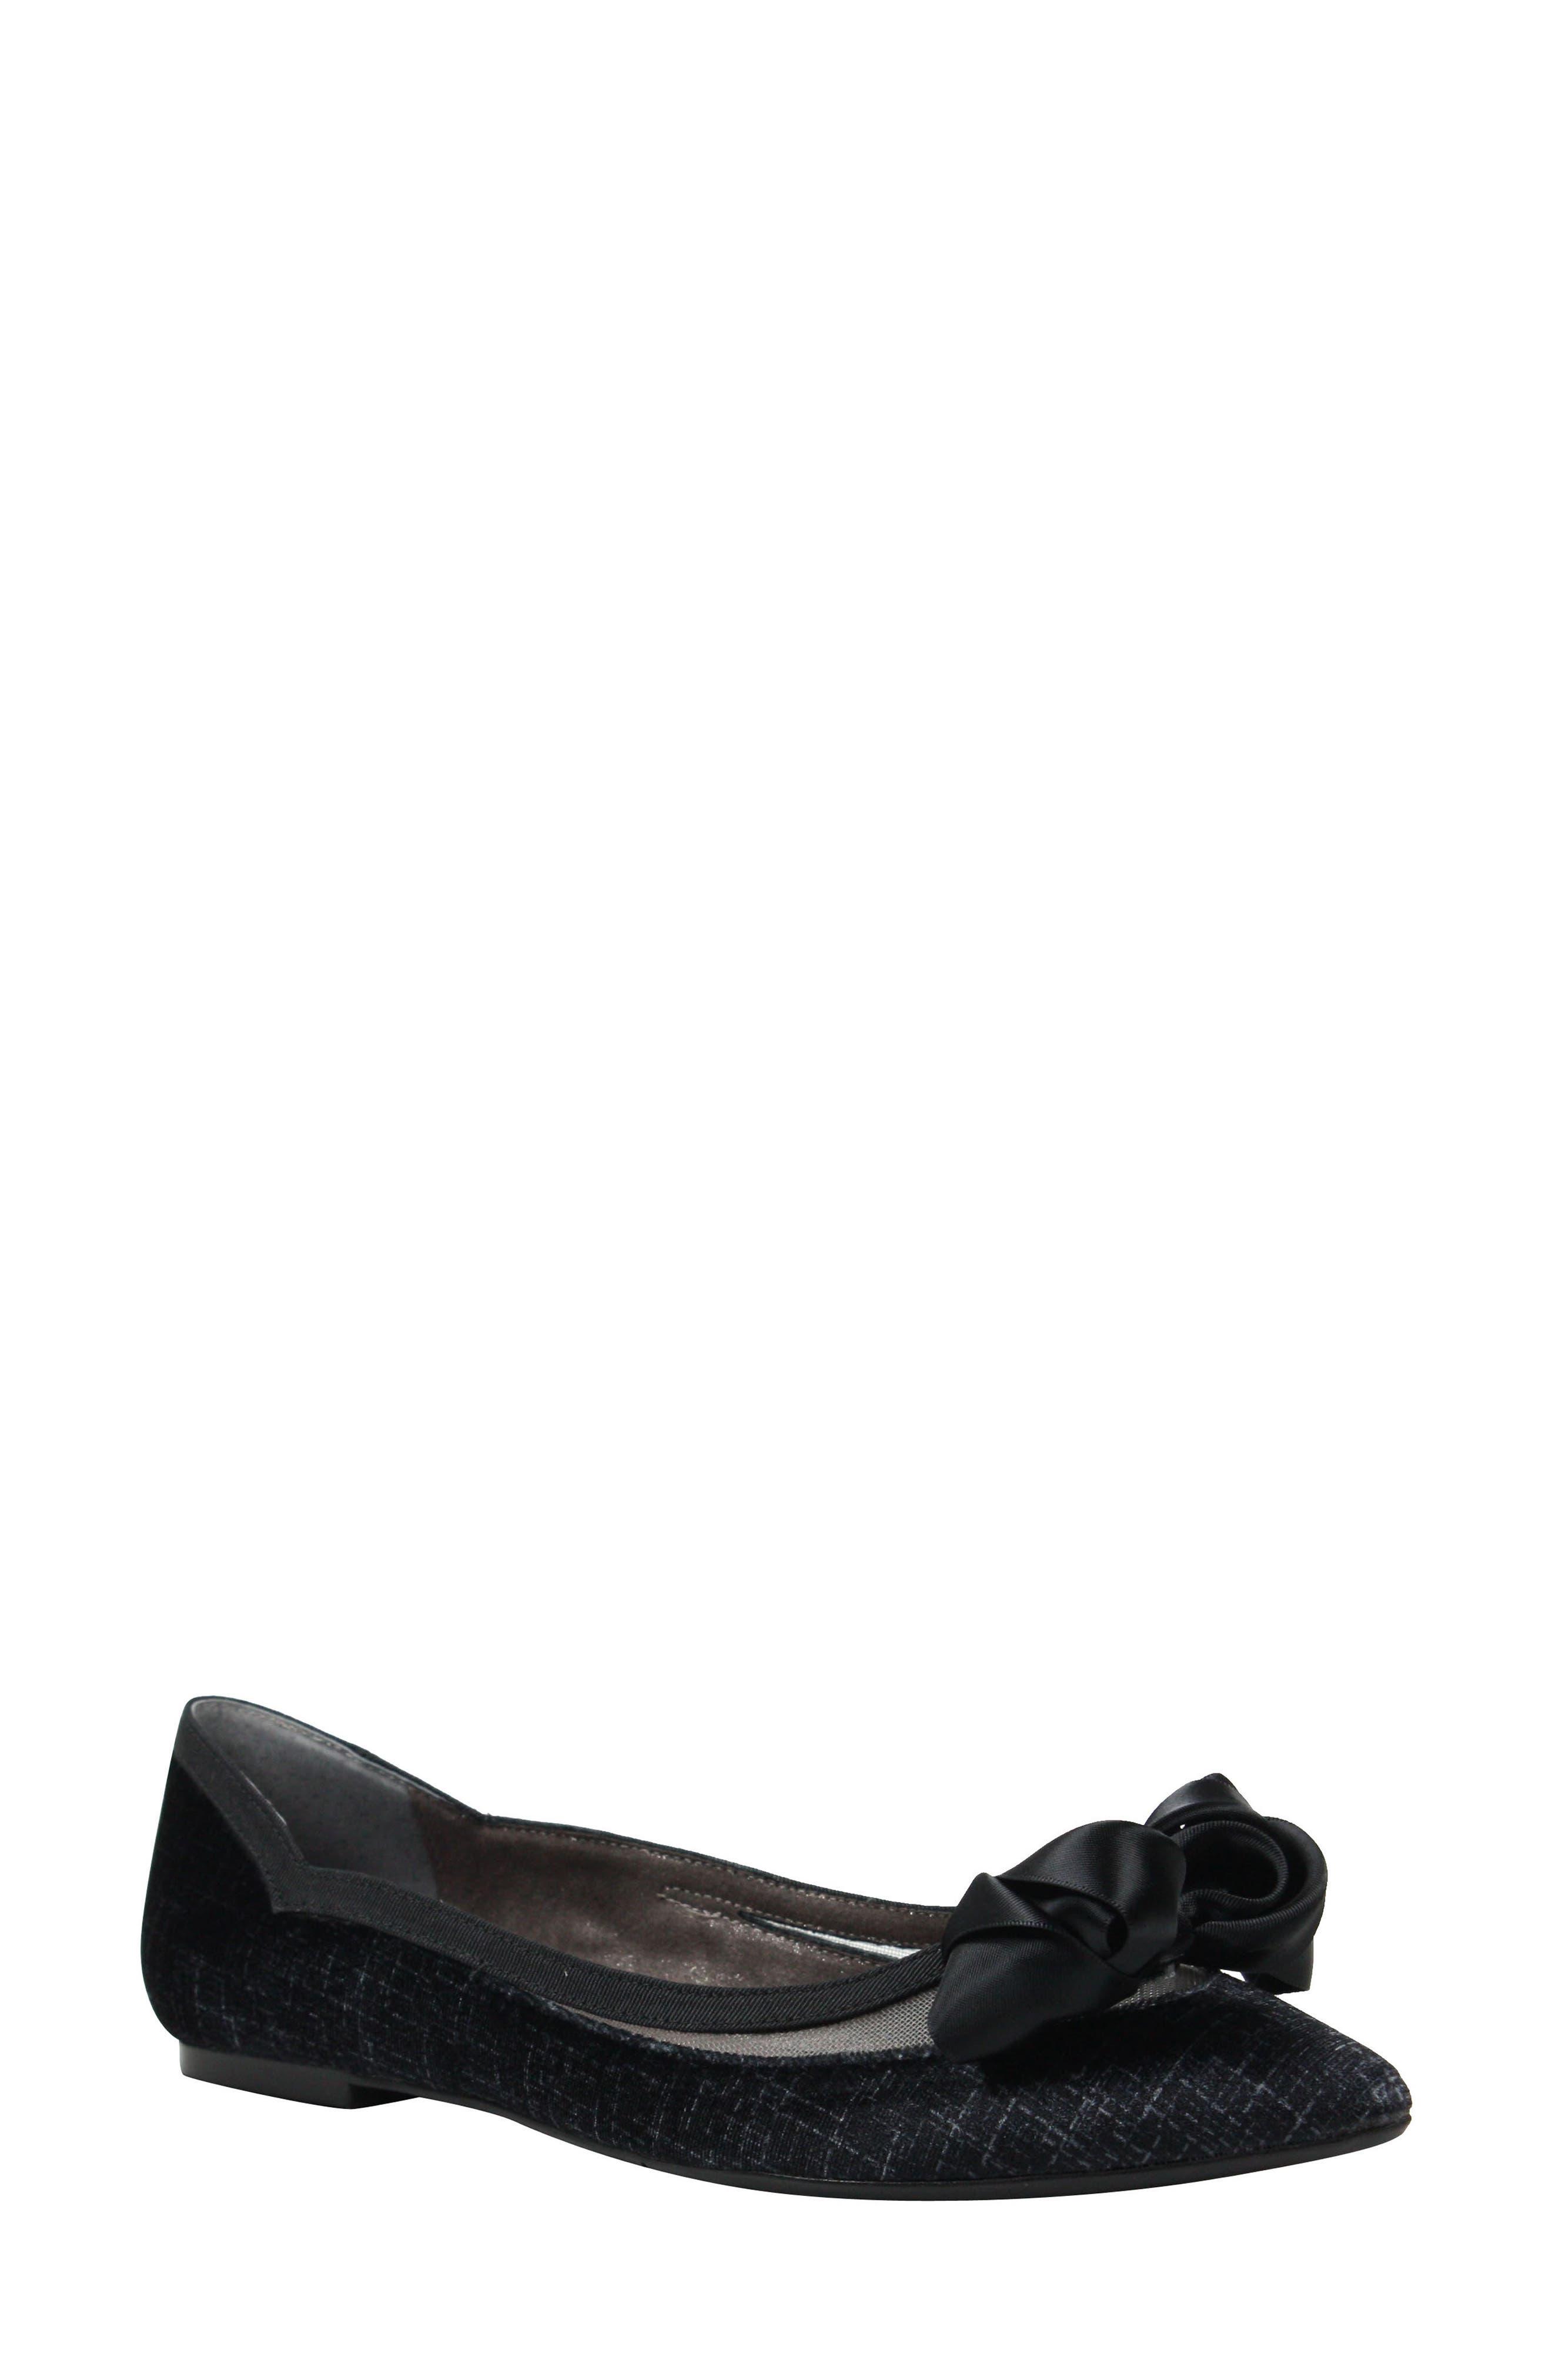 Allitson Bow Flat,                             Main thumbnail 1, color,                             TAUPE/ BLACK